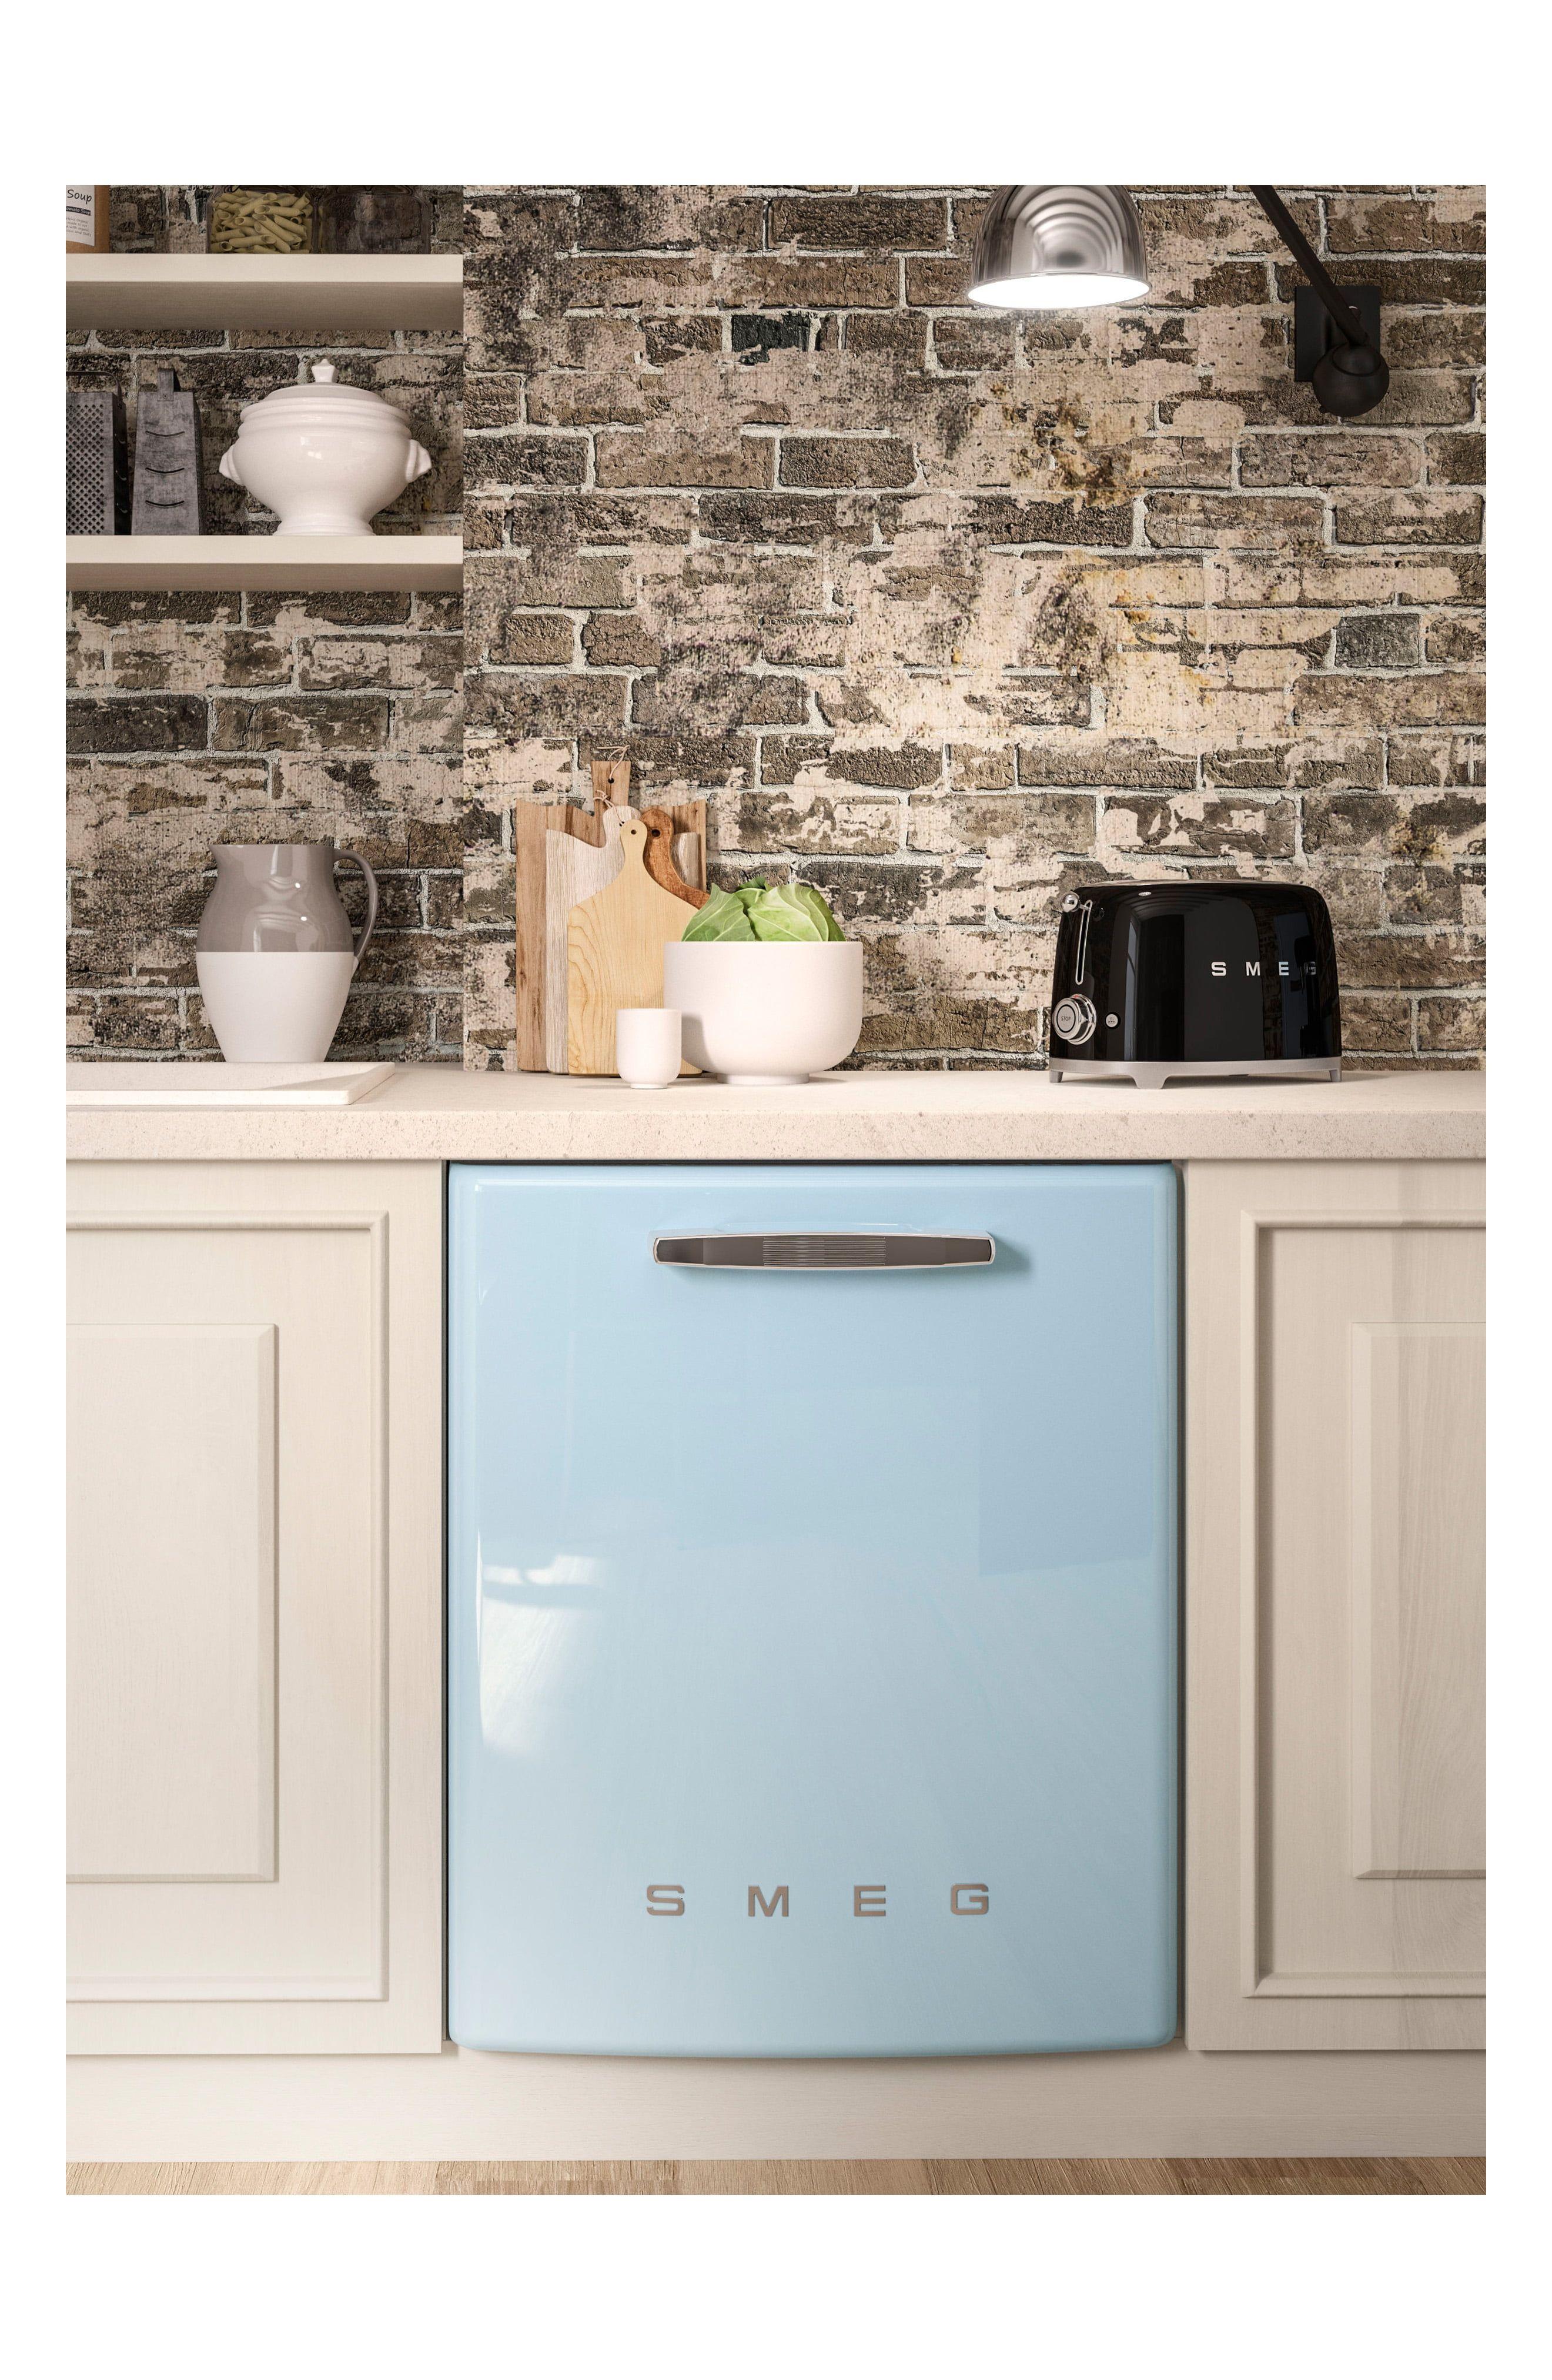 50s Retro Style Two Slice Toaster Nordstrom In 2021 Retro Kitchen Kitchen Cabinet Design Retro Appliances